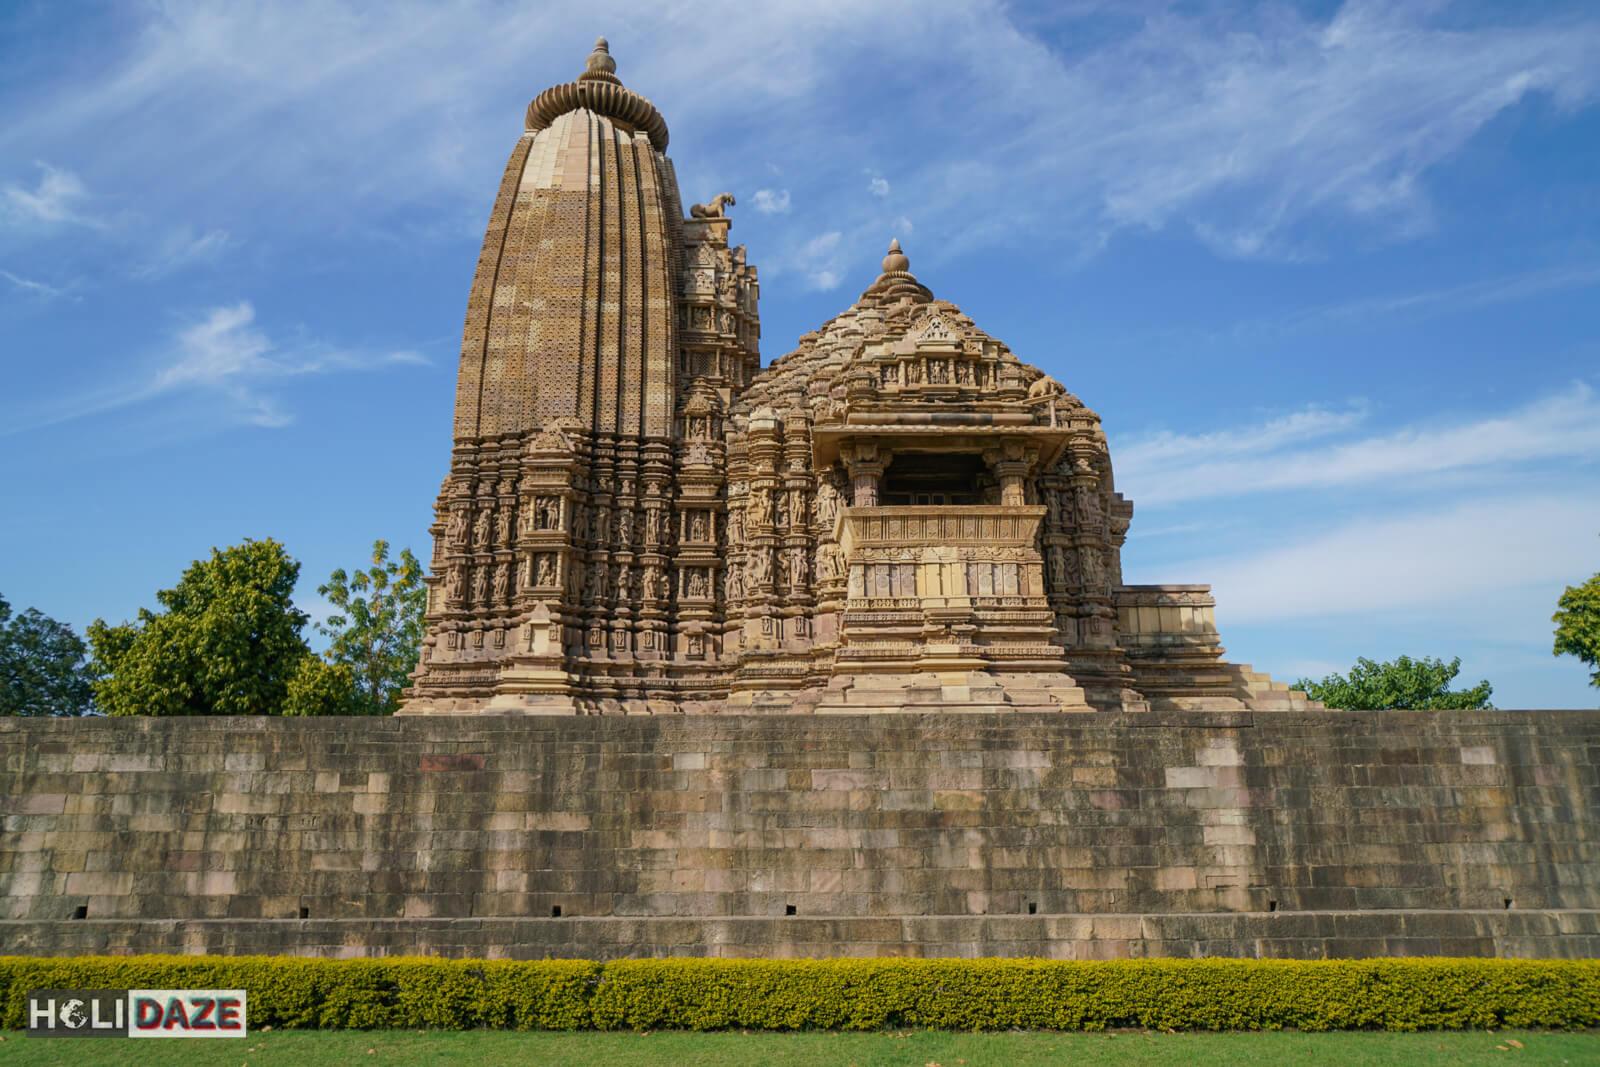 Exploring the 25 Khajuraho temples of Madhya Pradesh